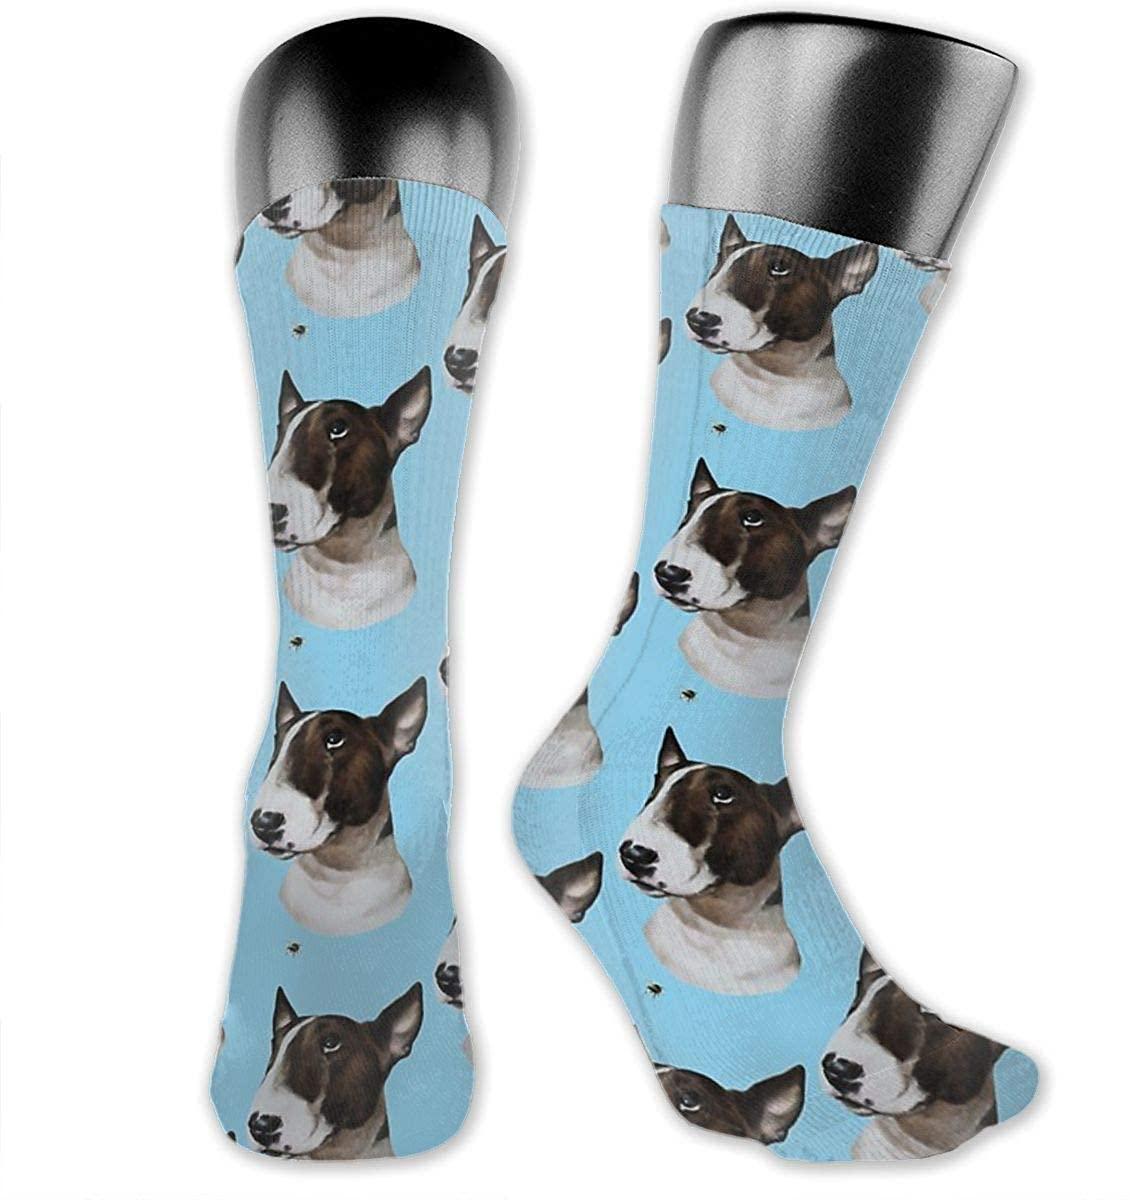 Unisex Crazy Funny Cool 3D Print Bull Terrier Bully And Bee Socks Colorful Running Sport Socks Novelty Casual Crew Socks